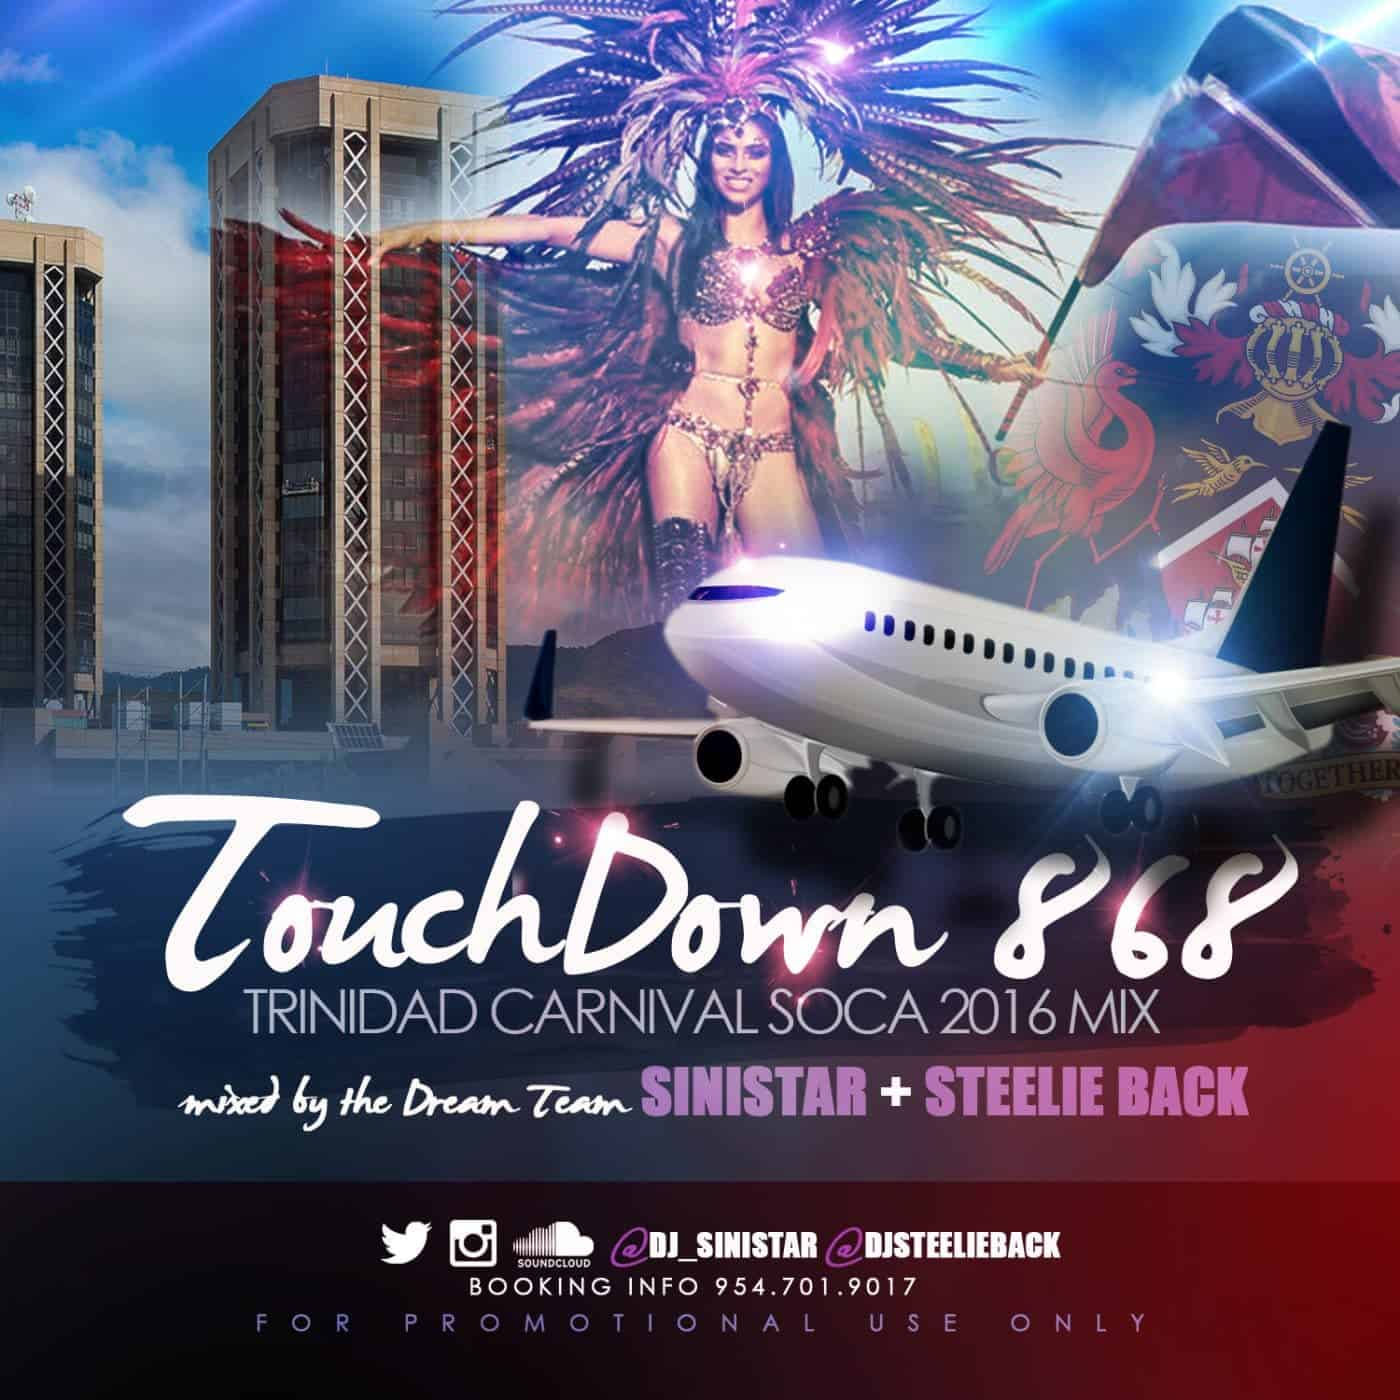 Dj Sinistar & Steelie Back - Touchdown 868 - Trinidad Carnival Soca